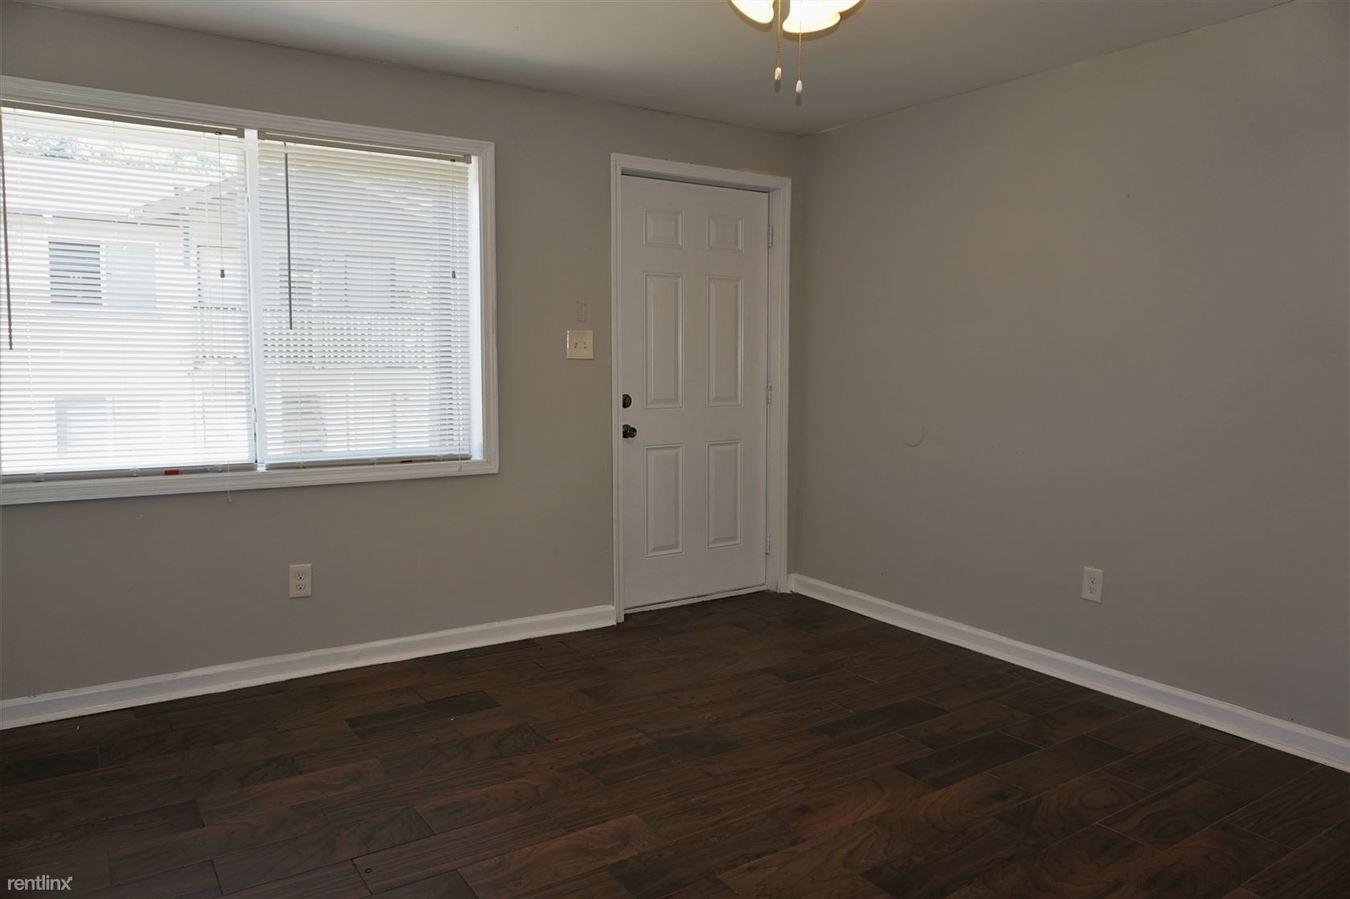 2 Bedrooms 1 Bathroom Apartment for rent at Gardens At Washington Park 2 in Atlanta, GA